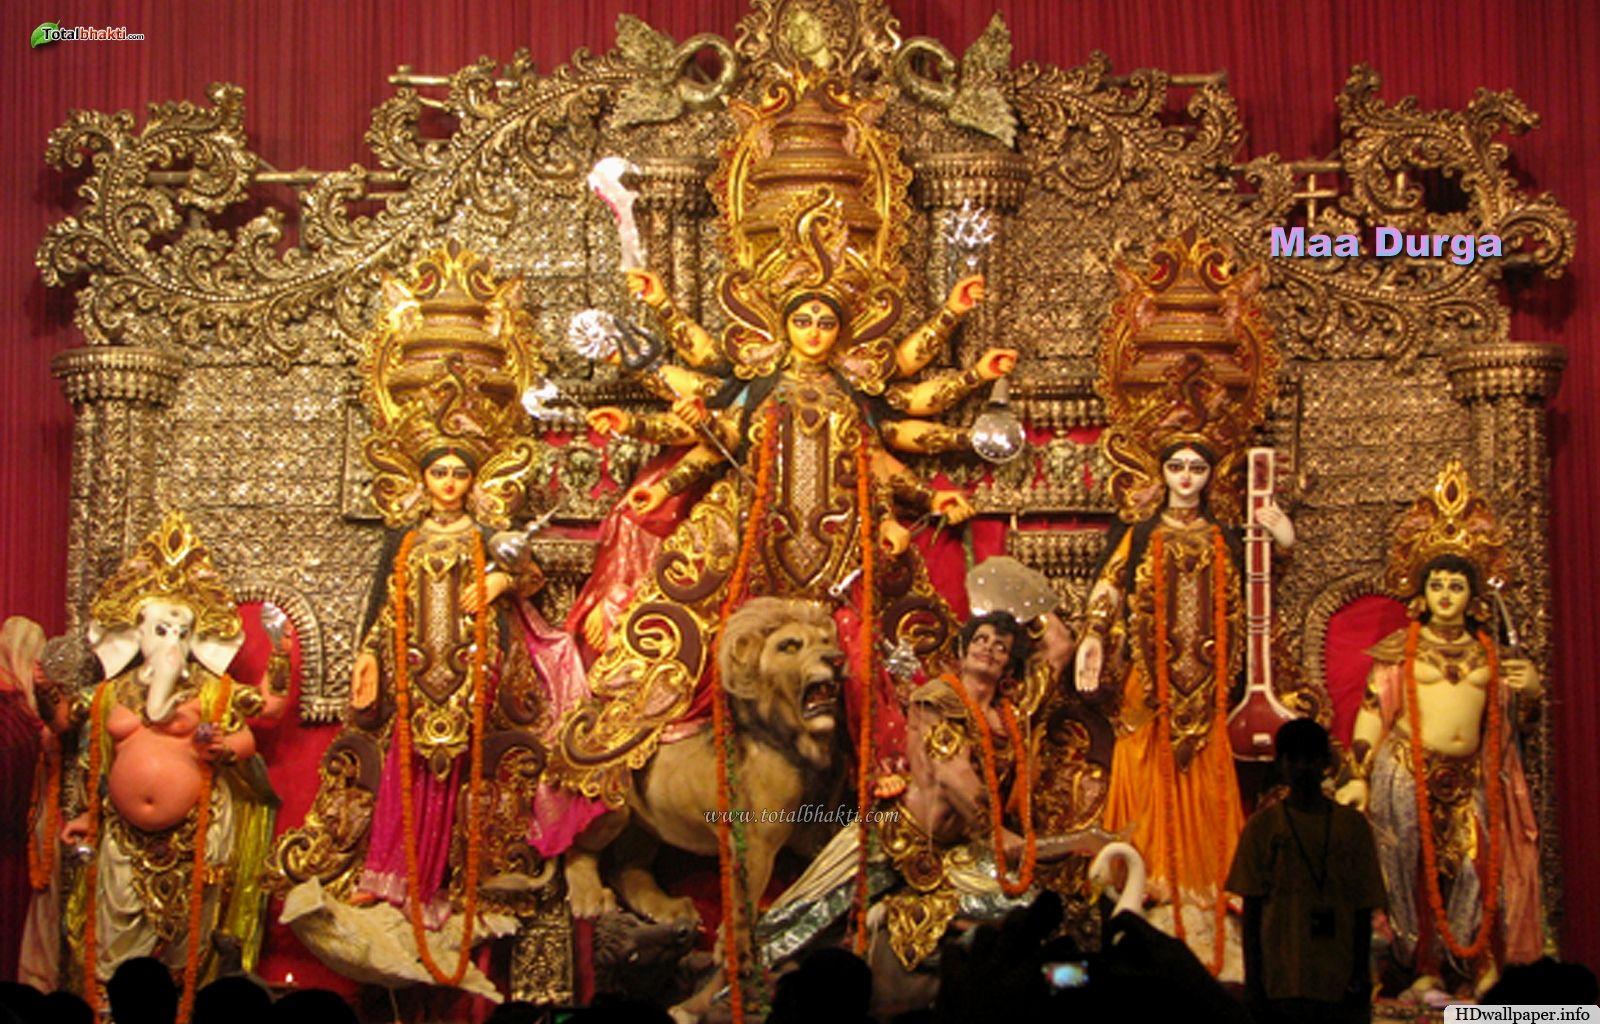 Maa Durga Wallpaper Full Size Hd For Pc Maa Durga Hd Wallpaper Durga Puja Durga